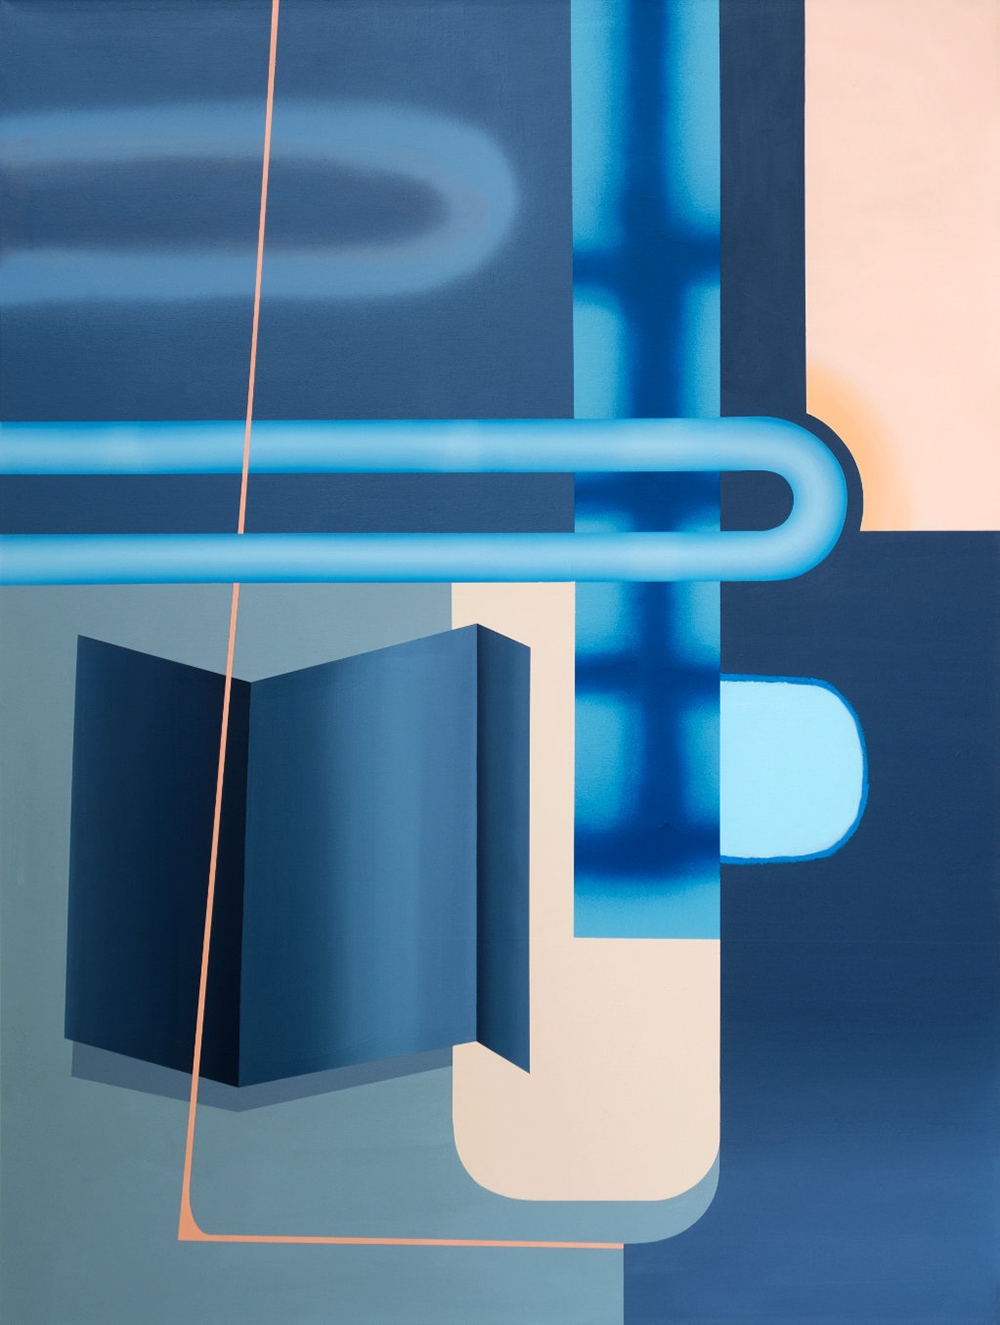 Identität_Nero_Big Book, 160 x 120 cm, Öl, Acryl, Sprühdose, Marker auf Leinwand, 2020